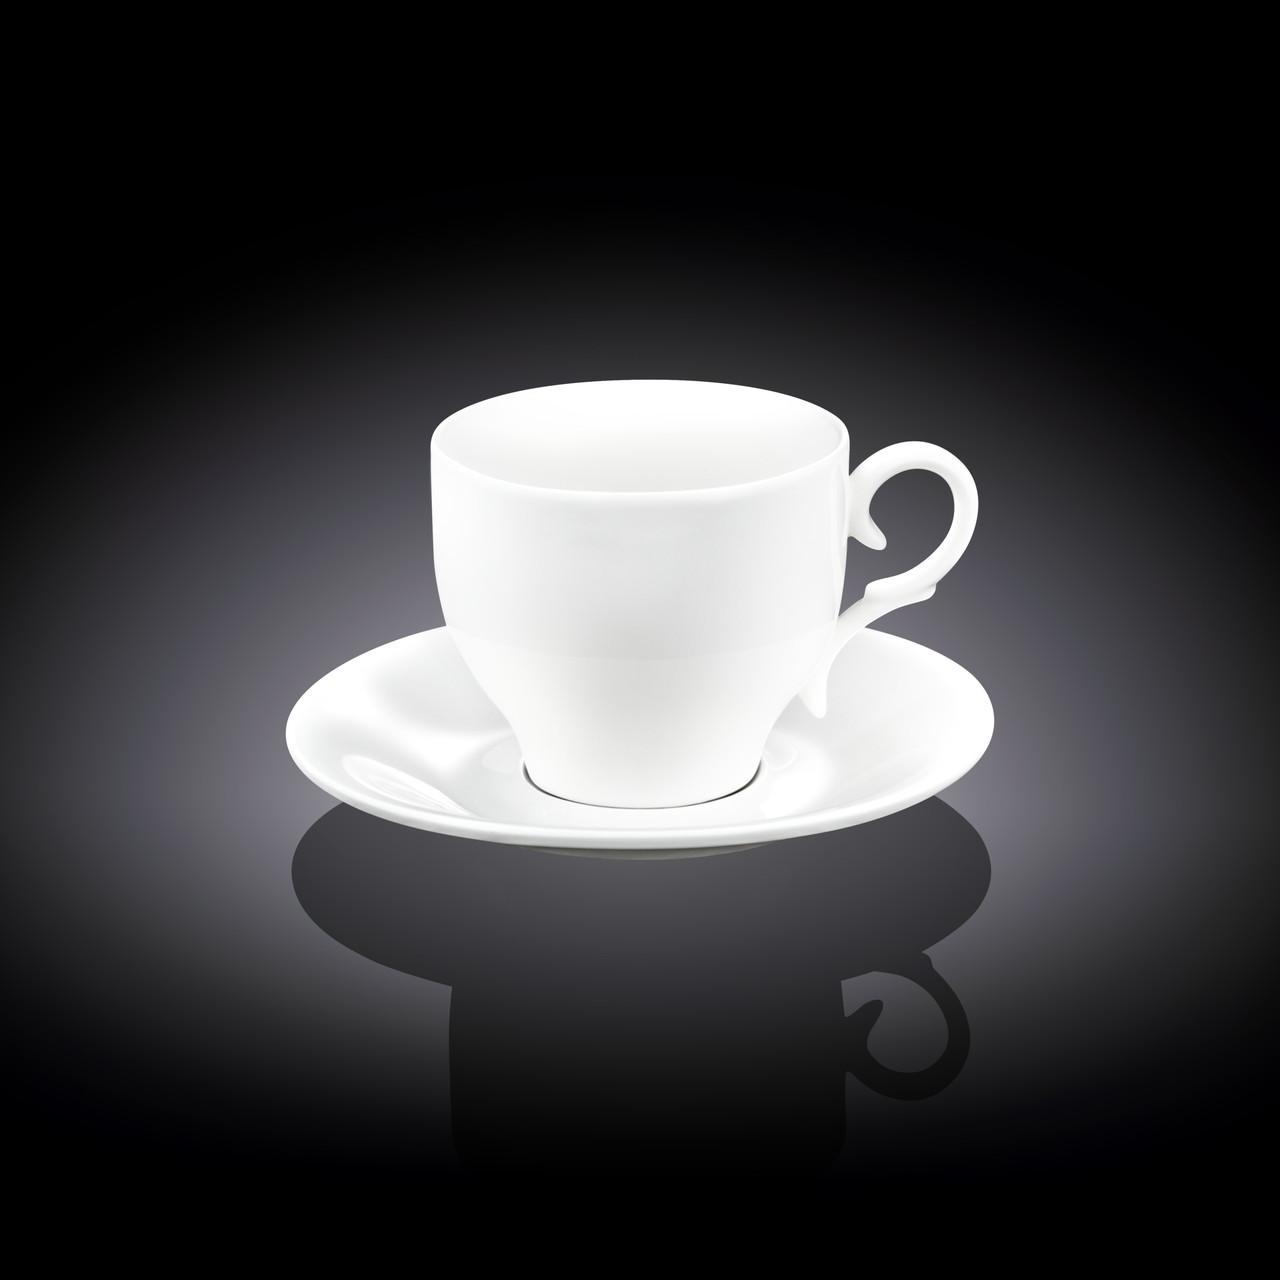 Чашка фарфоровая для кофе+блюдце WILMAX wl-993103 90 мл